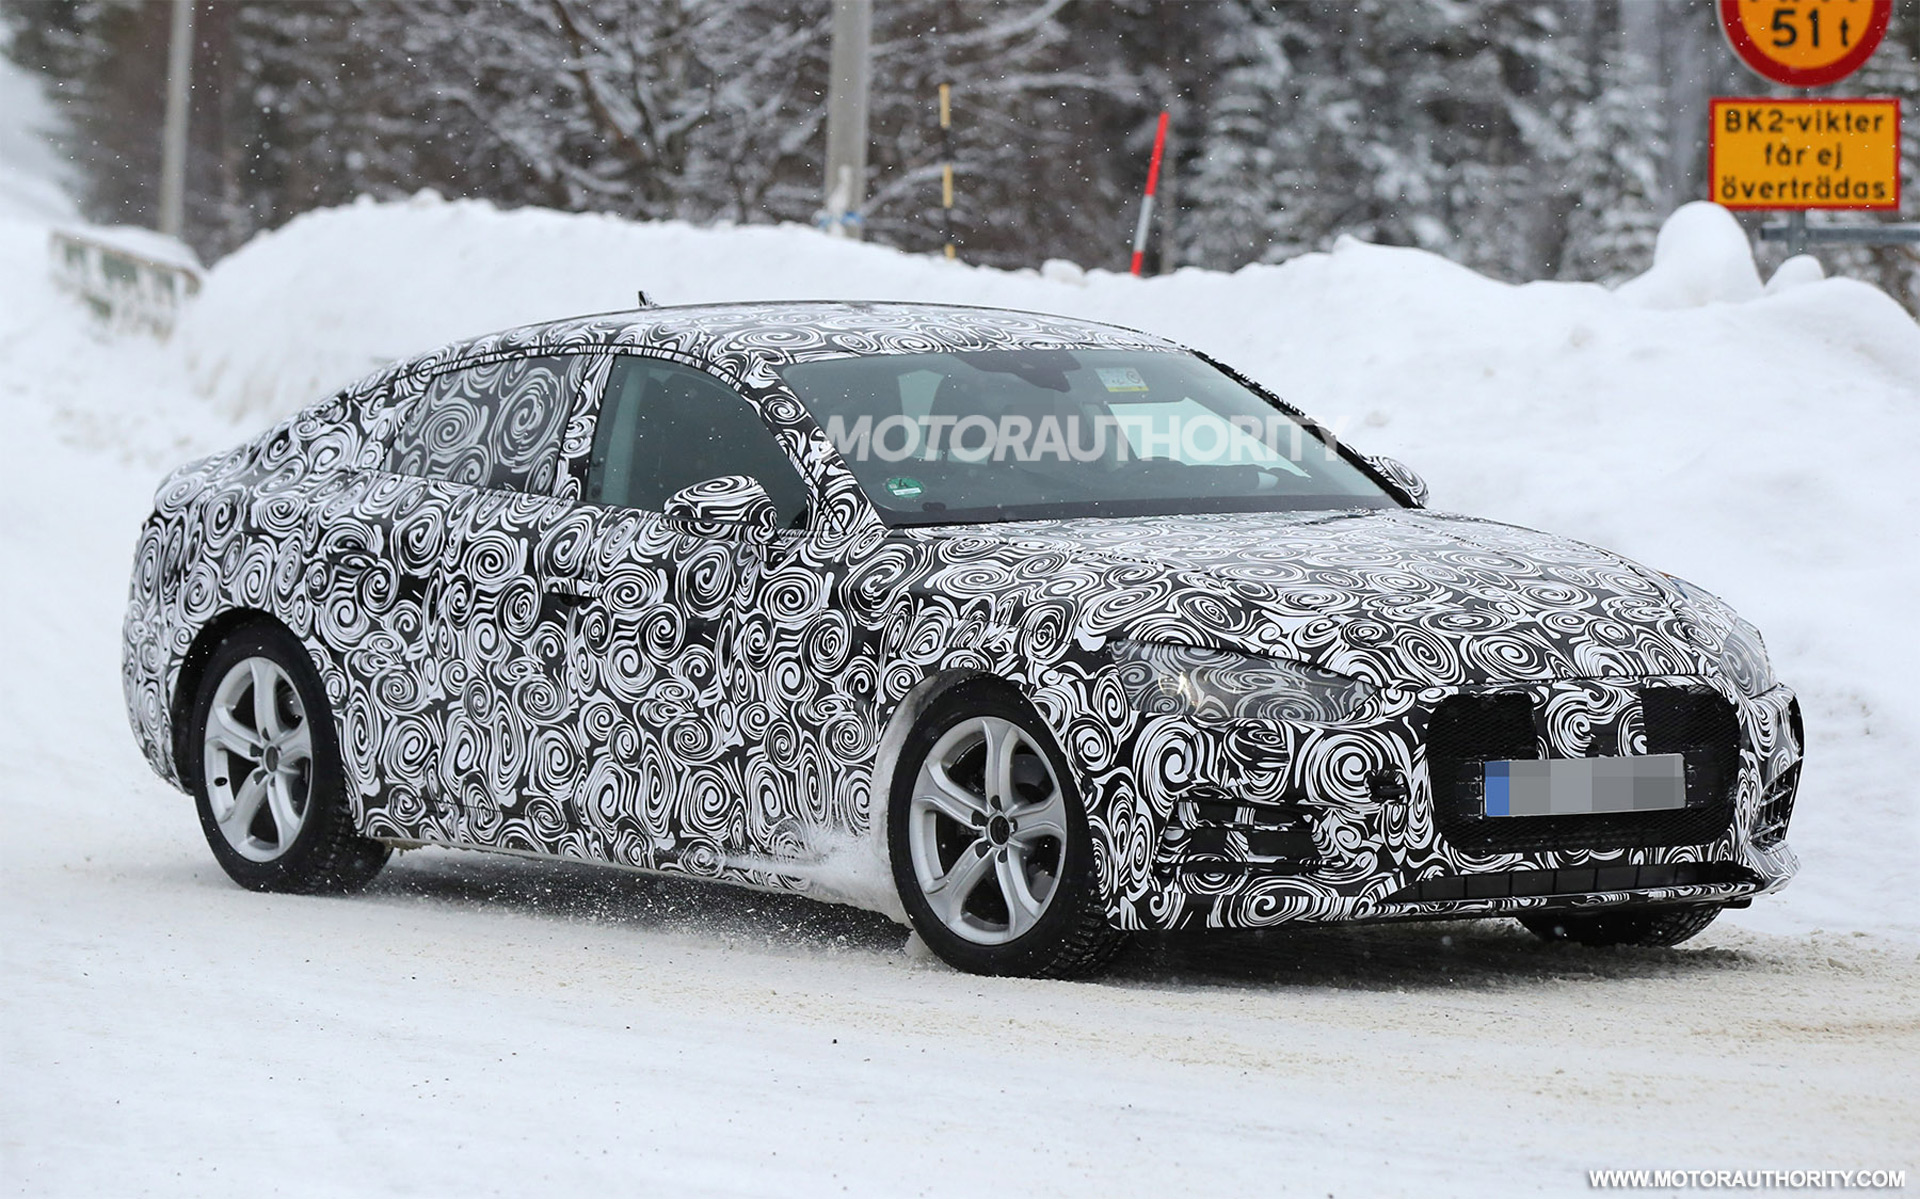 2018 Audi A5 Sportback, 2017 Chevy Camaro, Bugatti Chiron: This Week's Top Photos